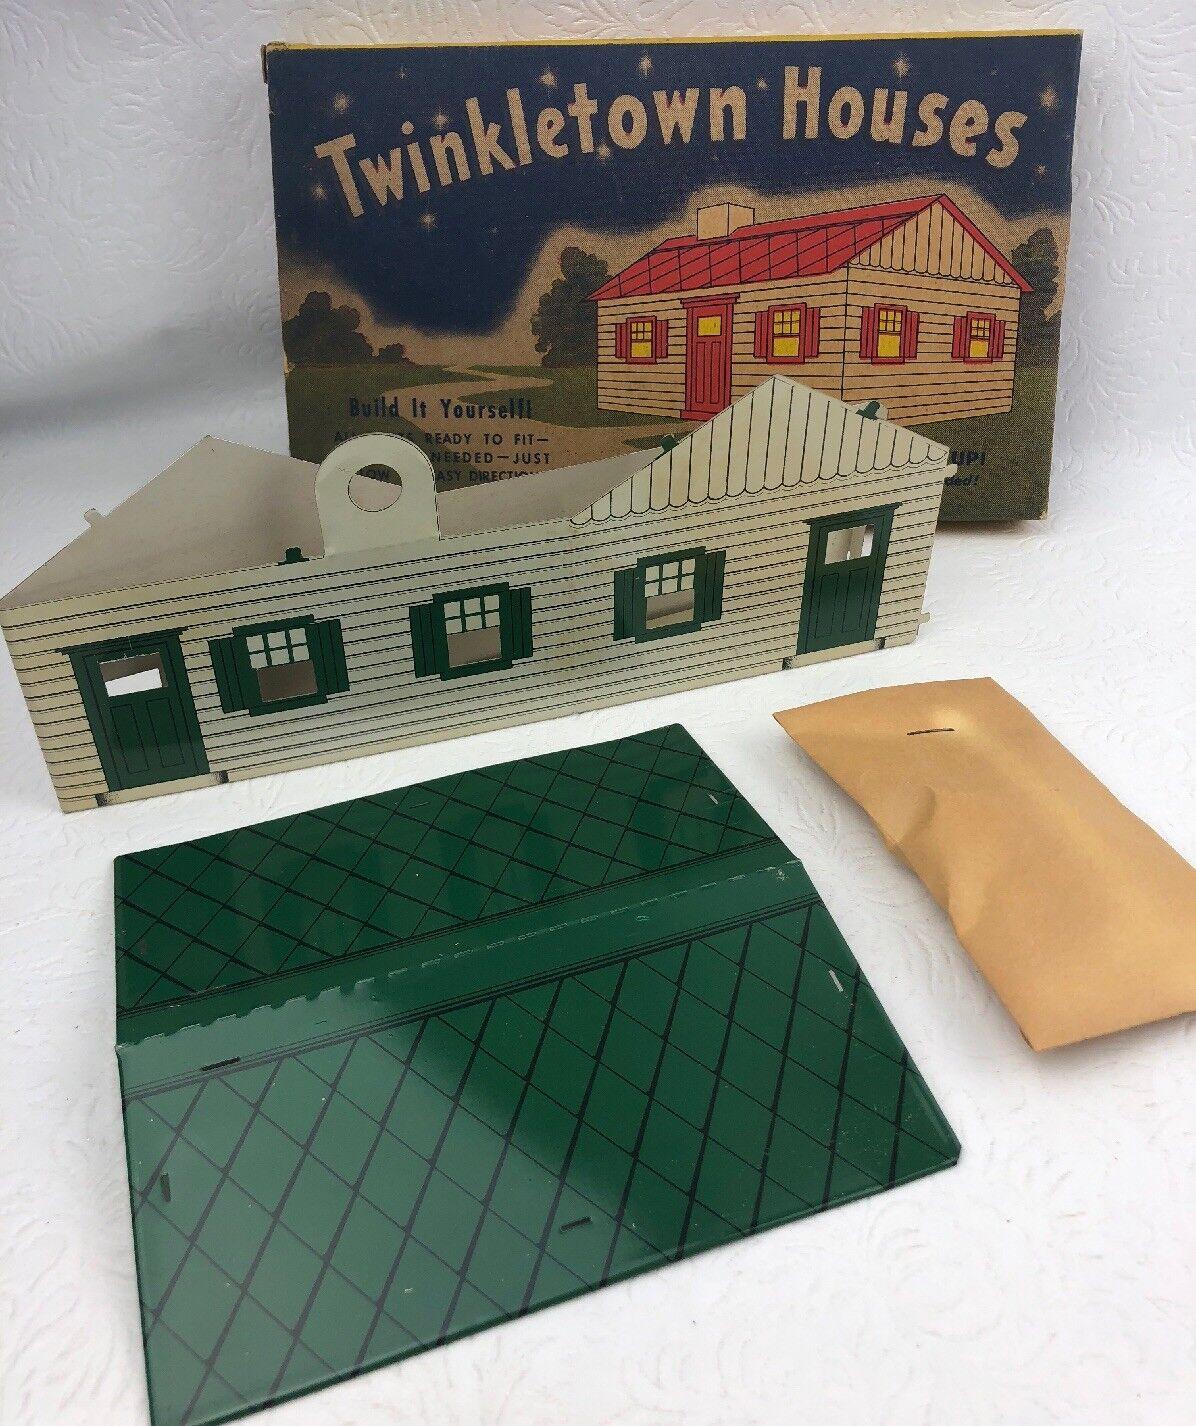 Vintage H&h ventas twinkletown Metal Casa verde y blancooo se enciende Caja Original